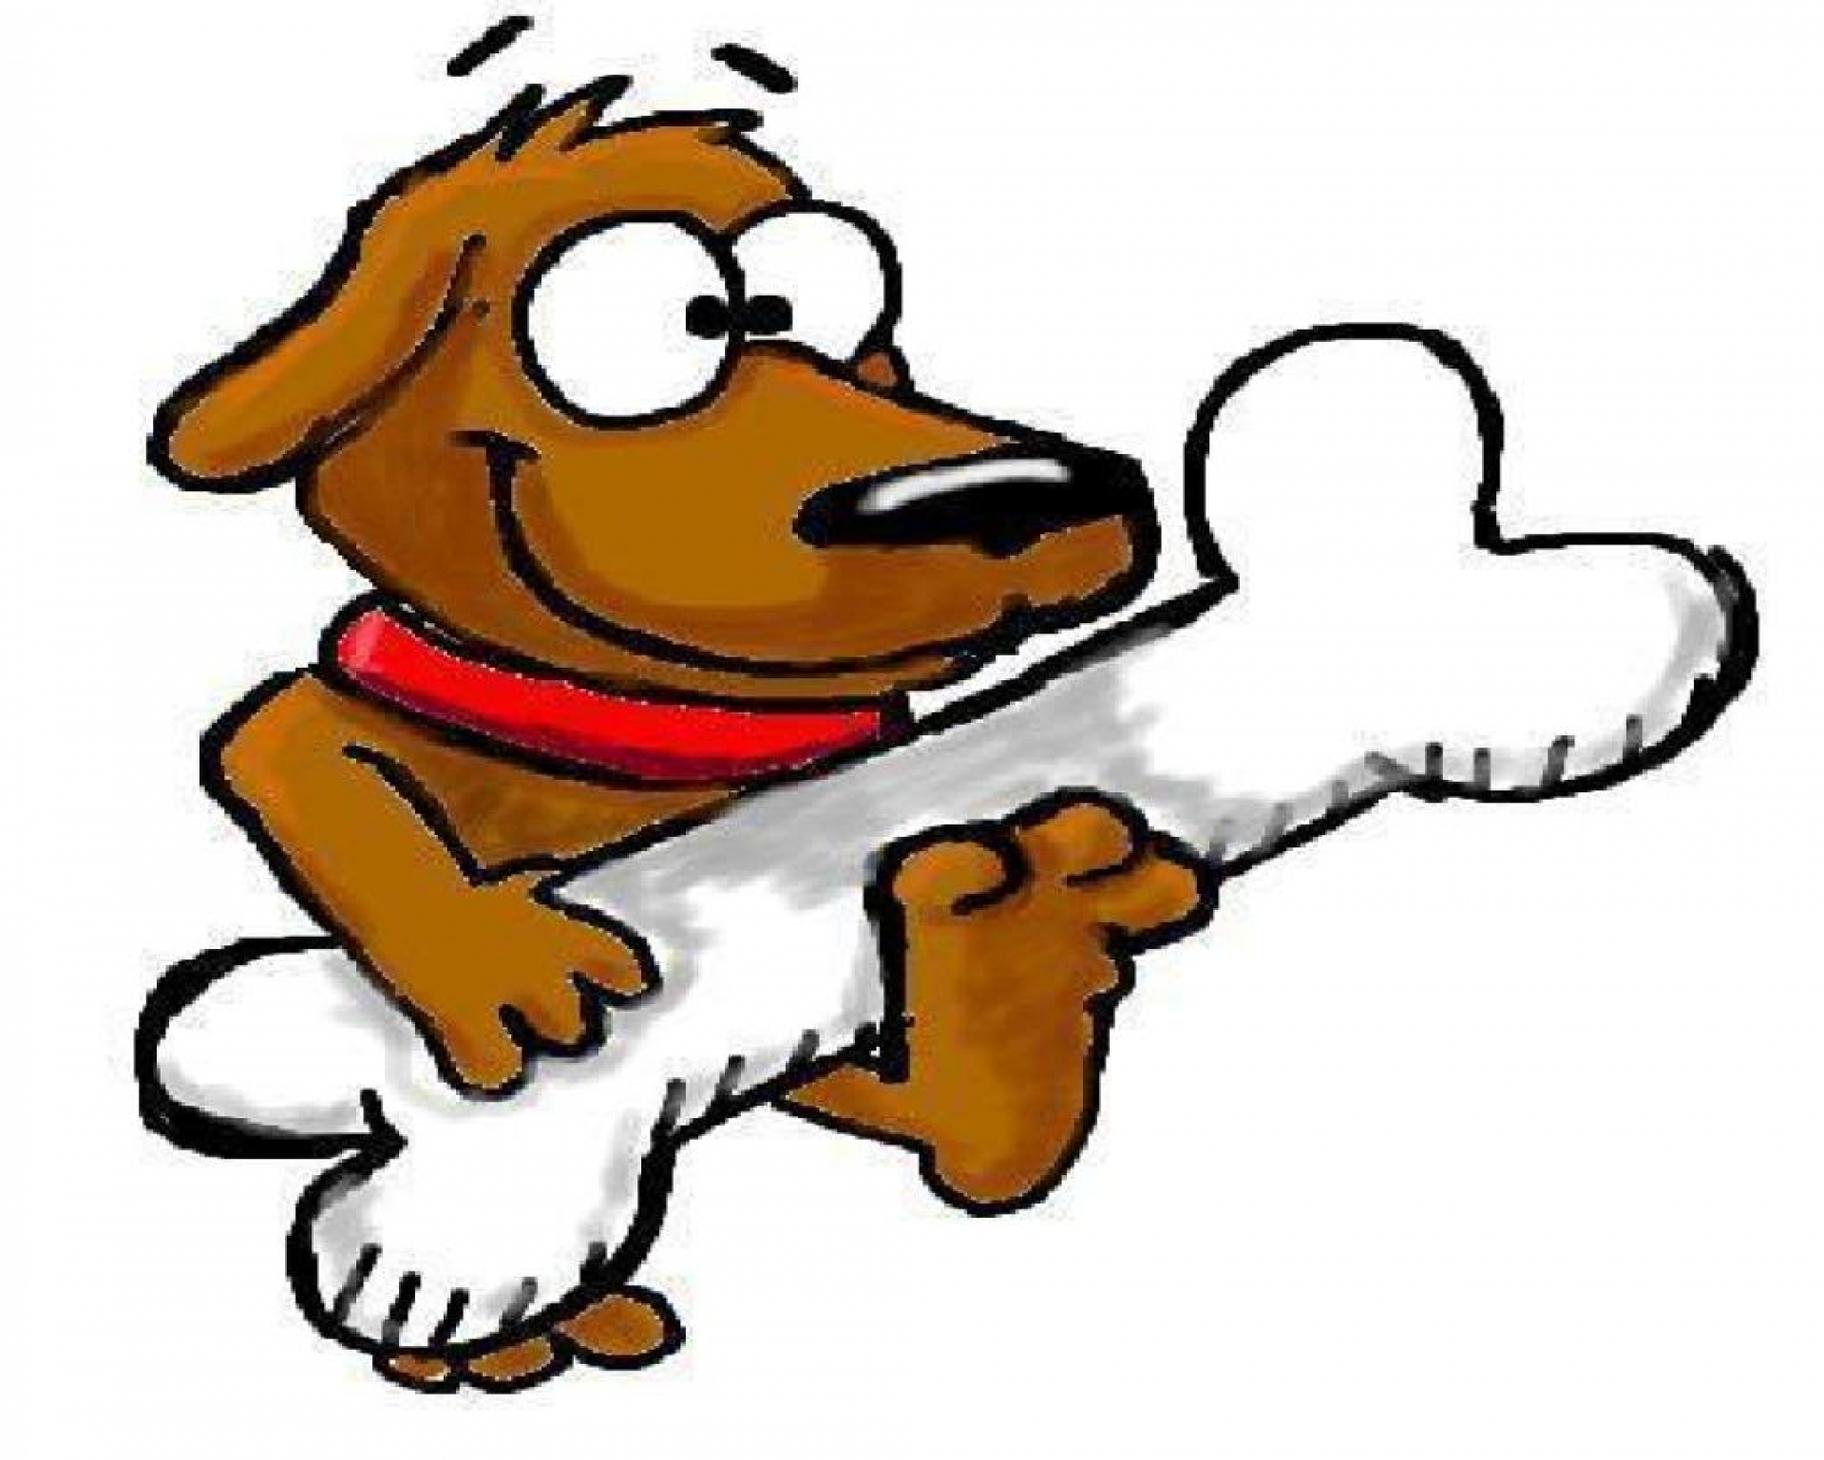 CREATING IN PARADISE: Dog with Bone | Cartoon clip art, Dog caricature,  Clip art